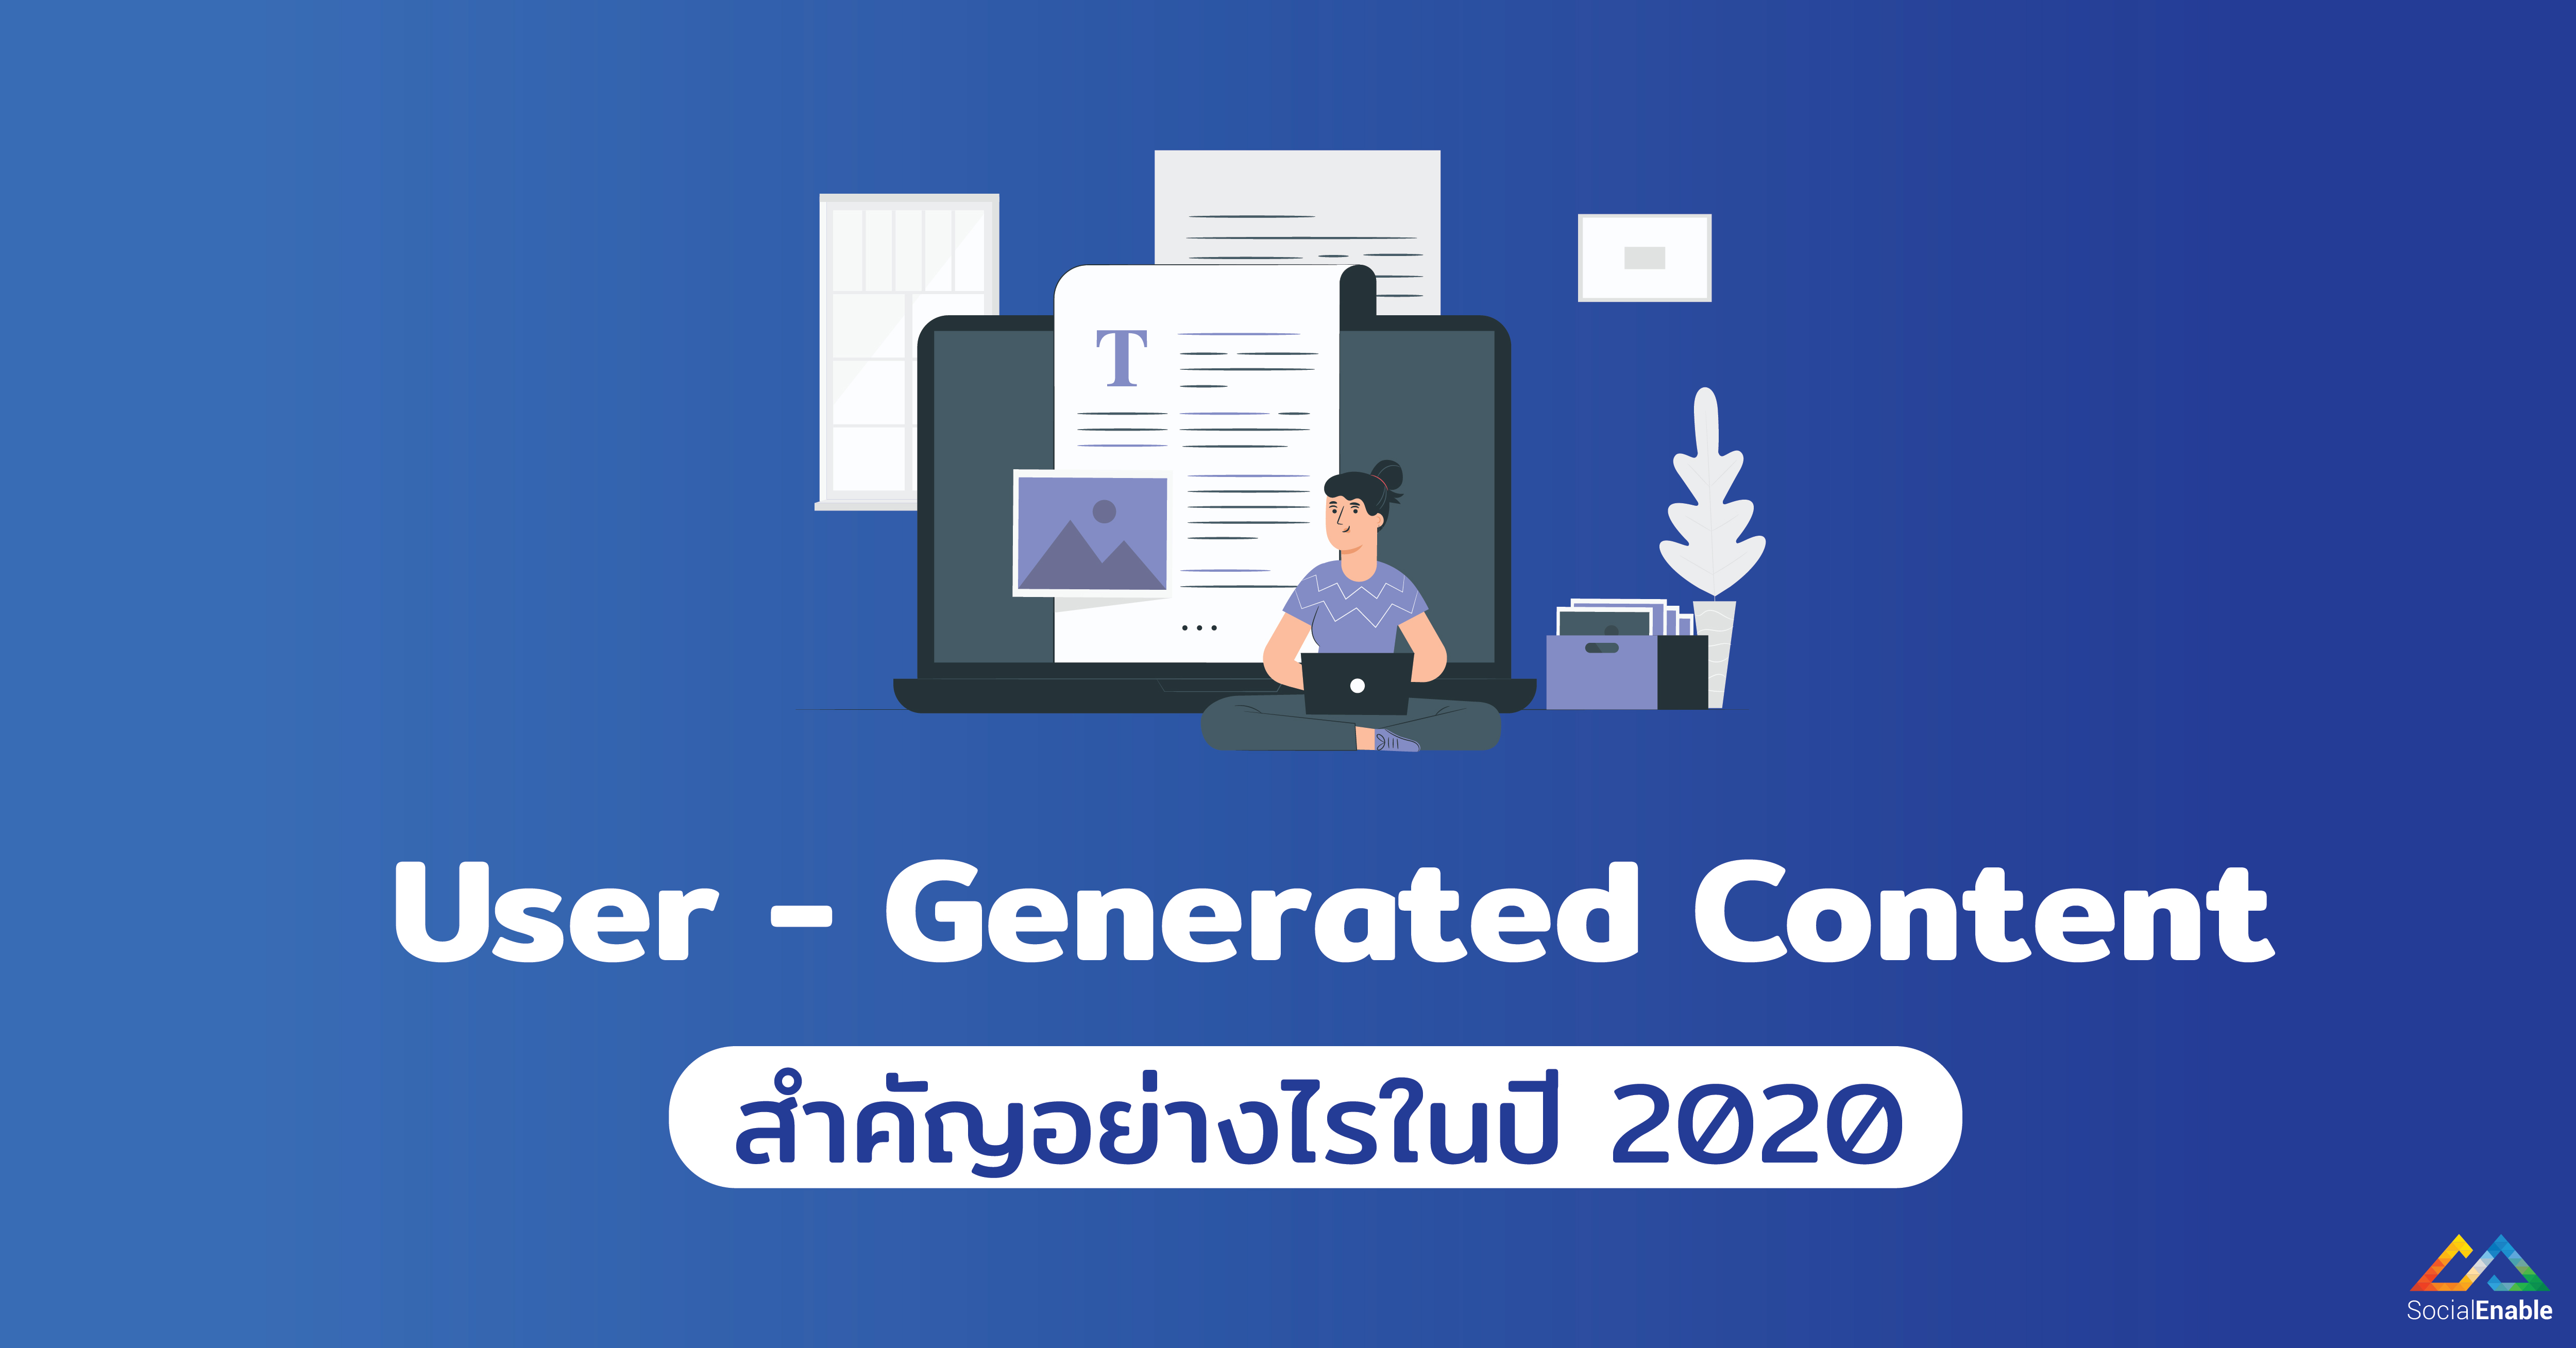 User – generated content สำคัญอย่างไรในปี 2020